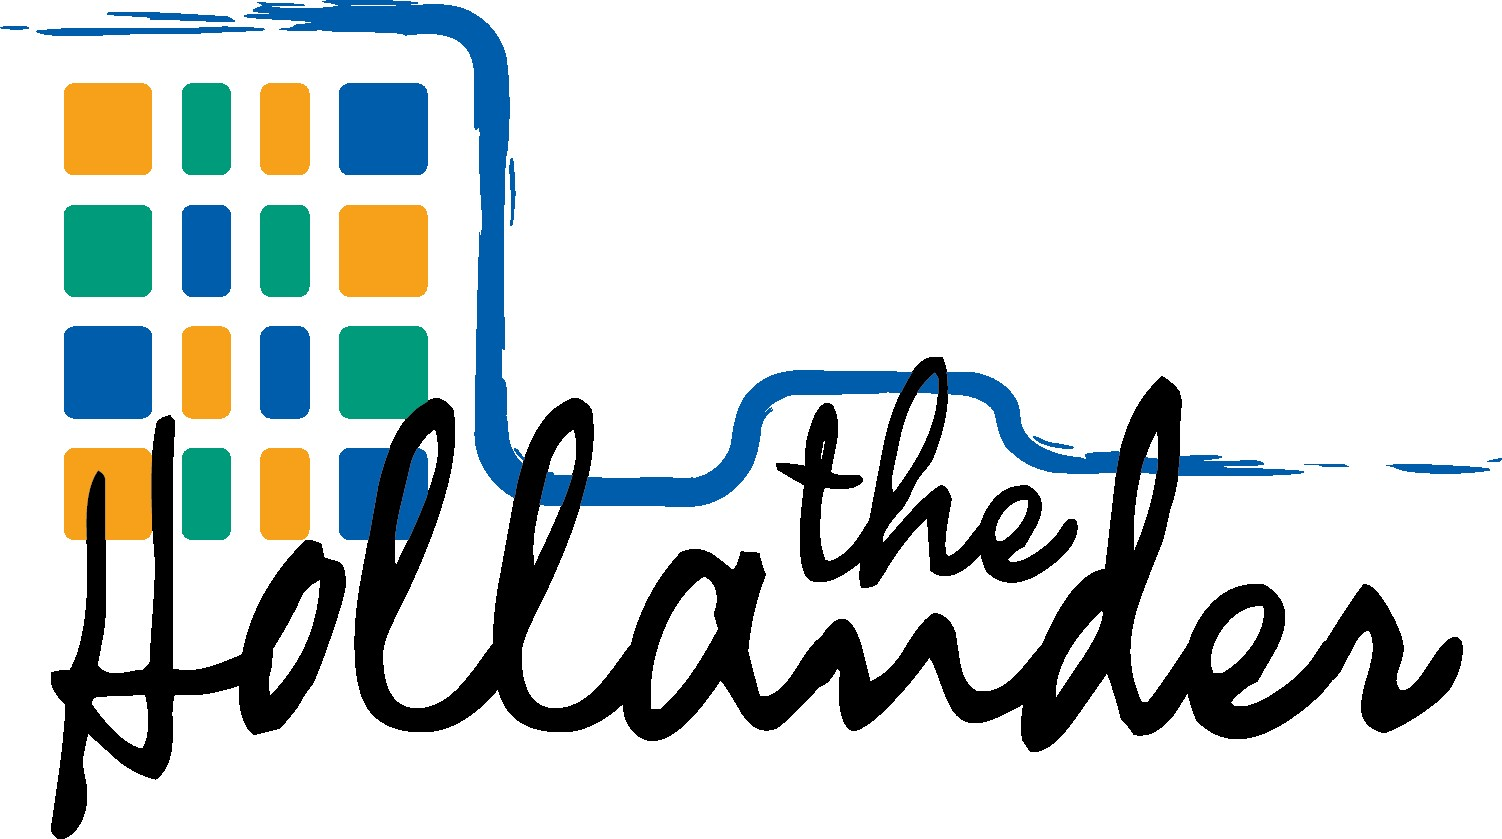 The Hollander Menu